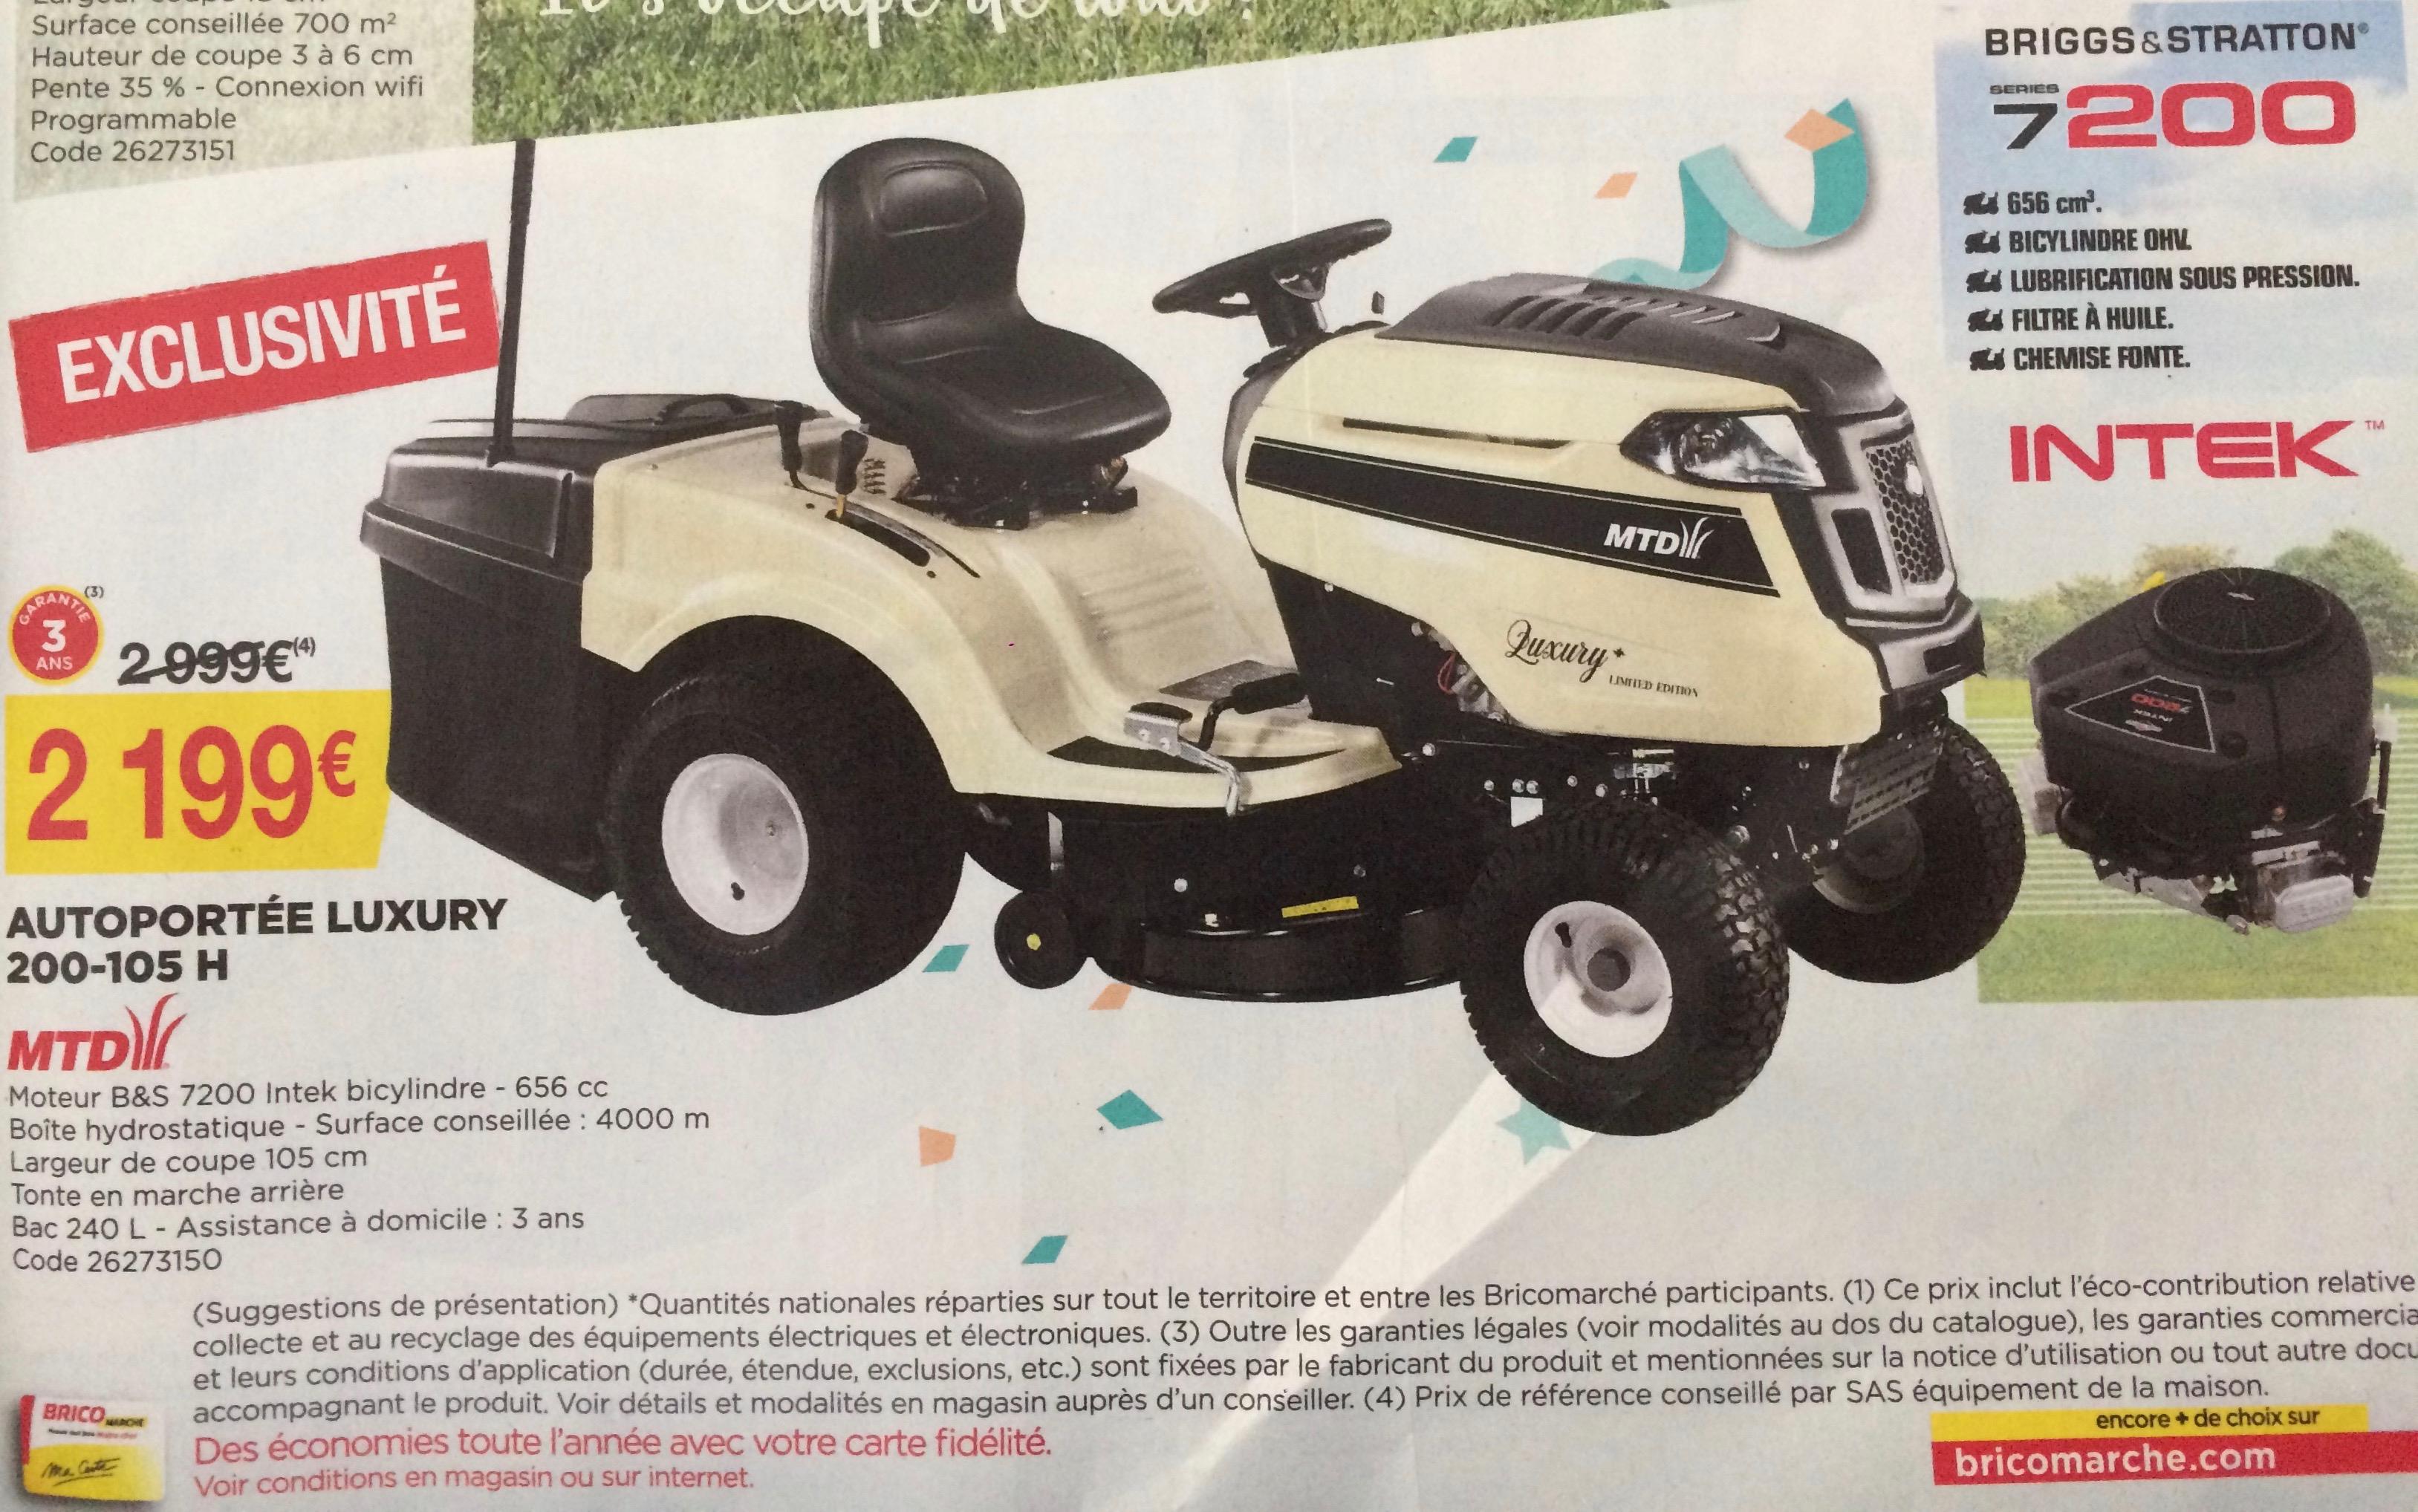 Tondeuse autoportée MTD Luxury 200-105H